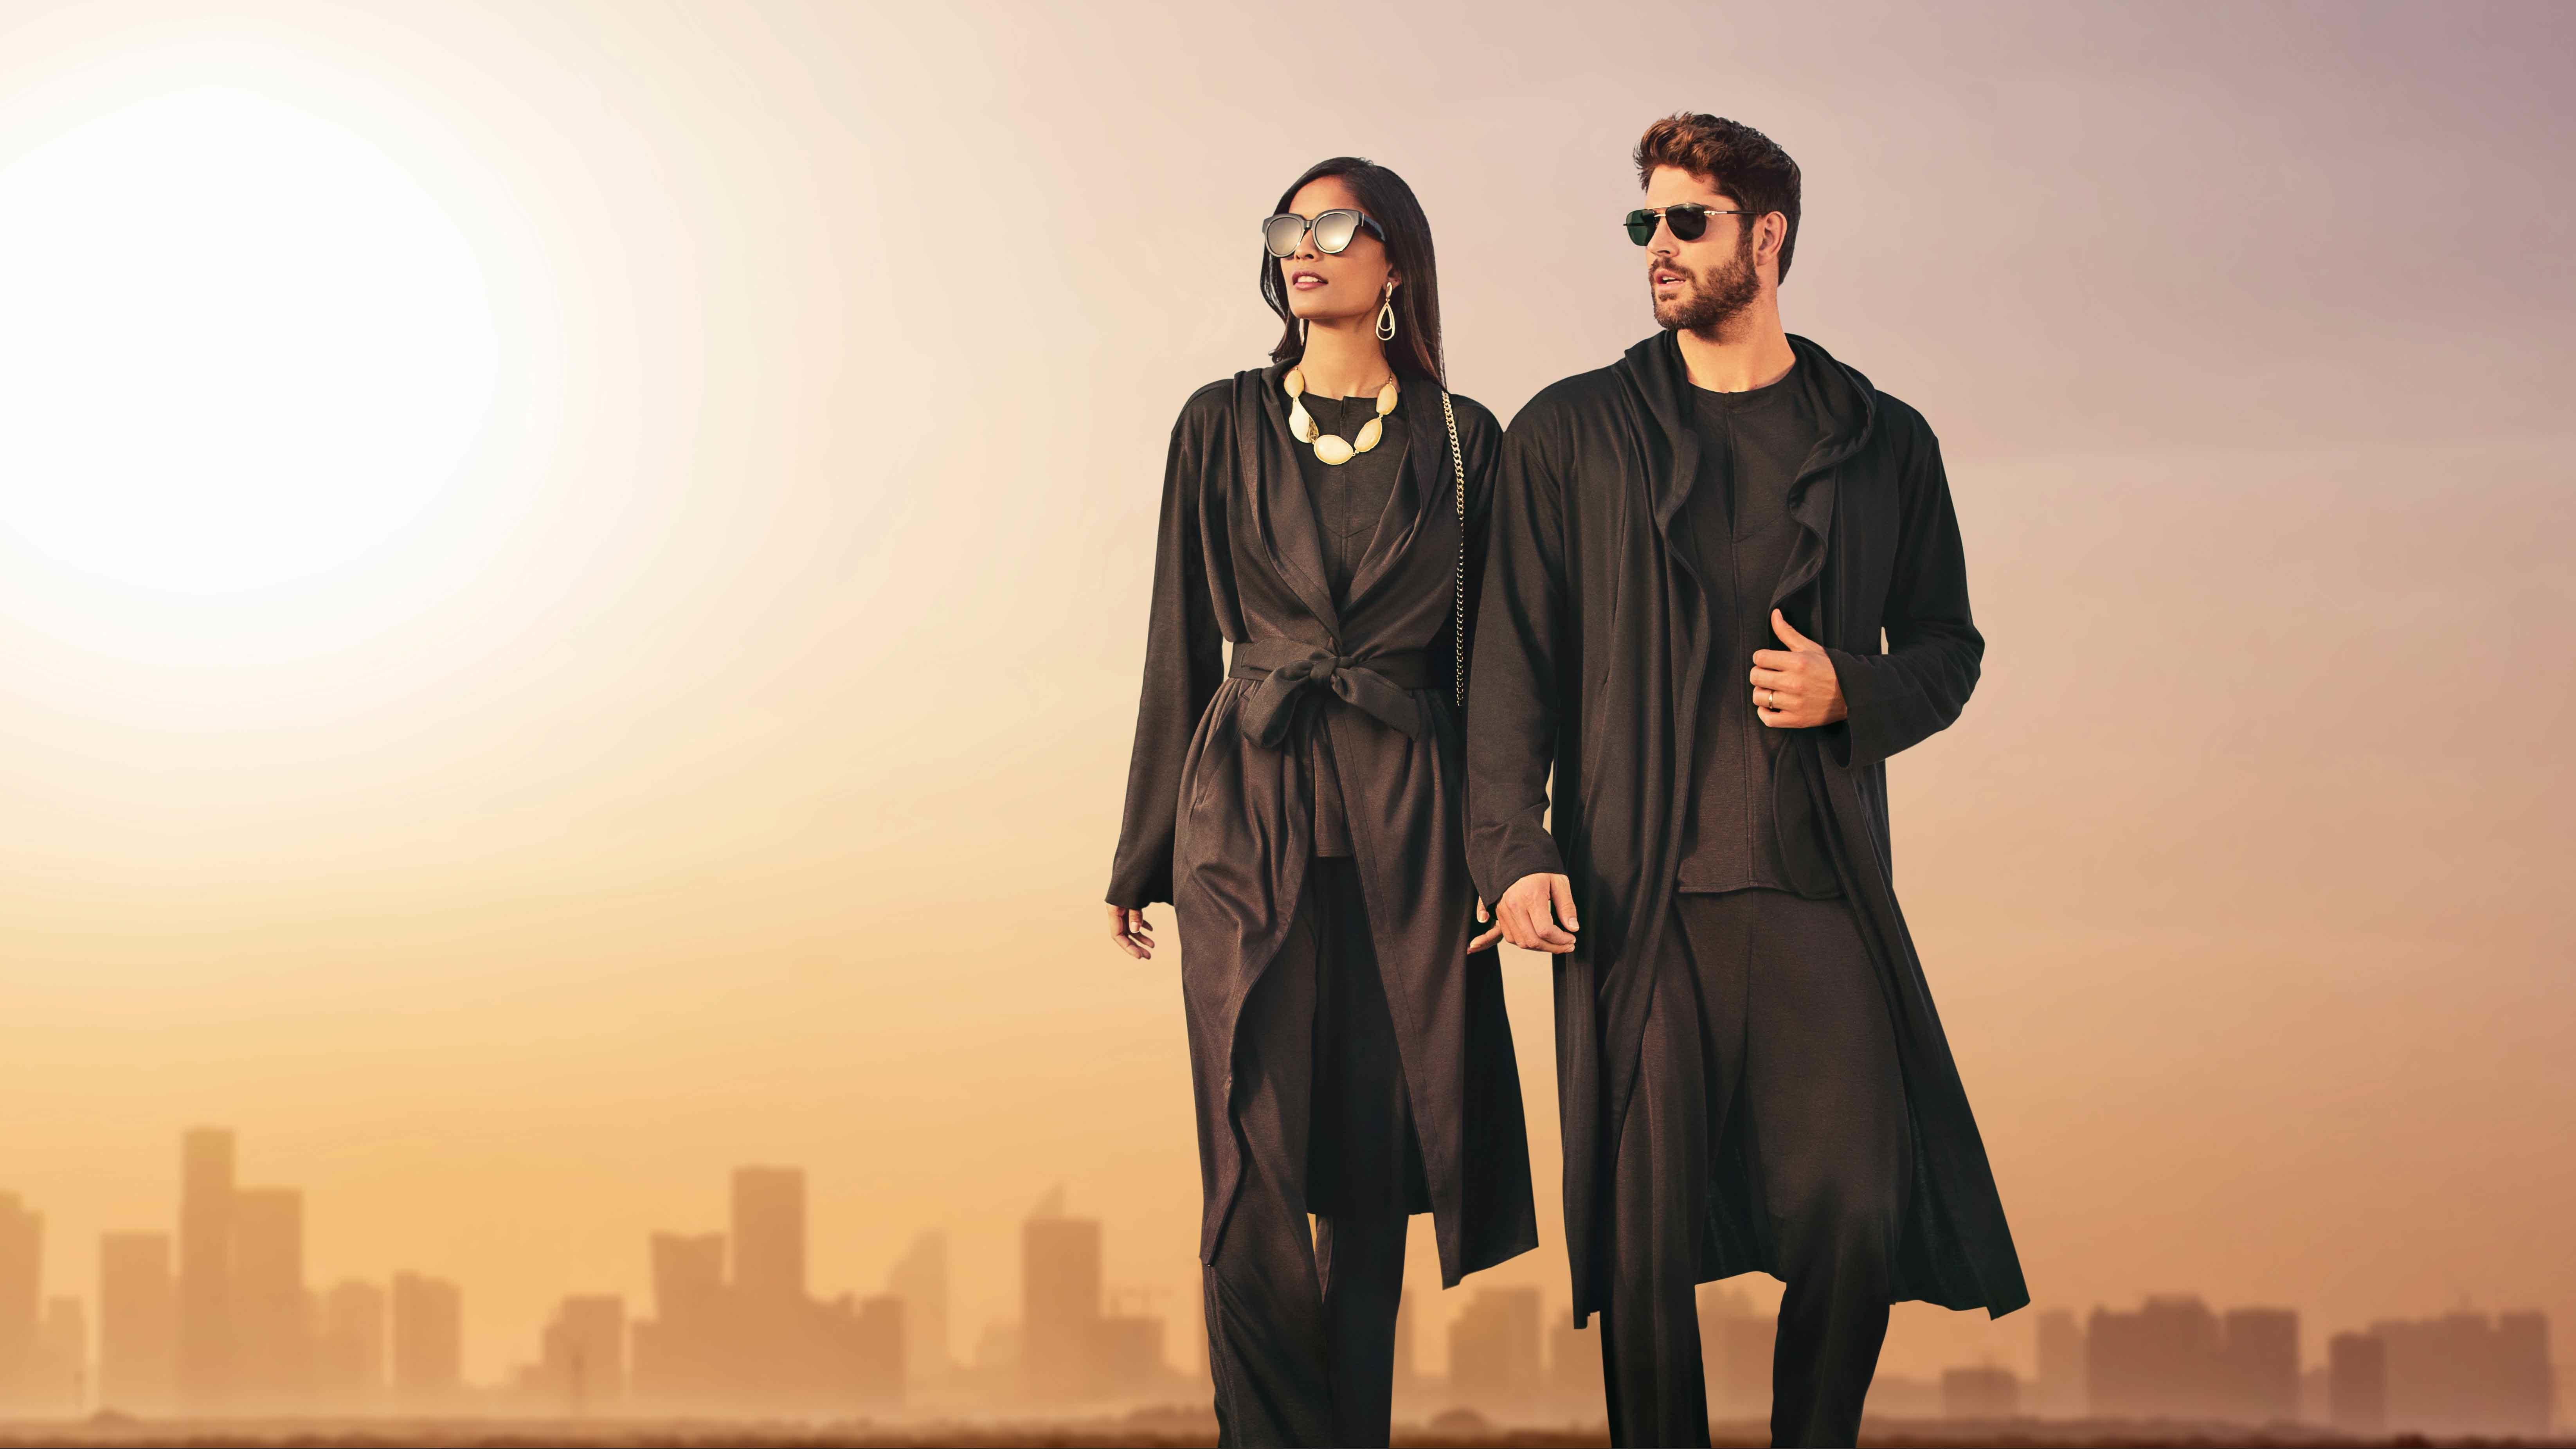 Etihad Collaborates With Emirati Fashion Brand On First Class Loungewear